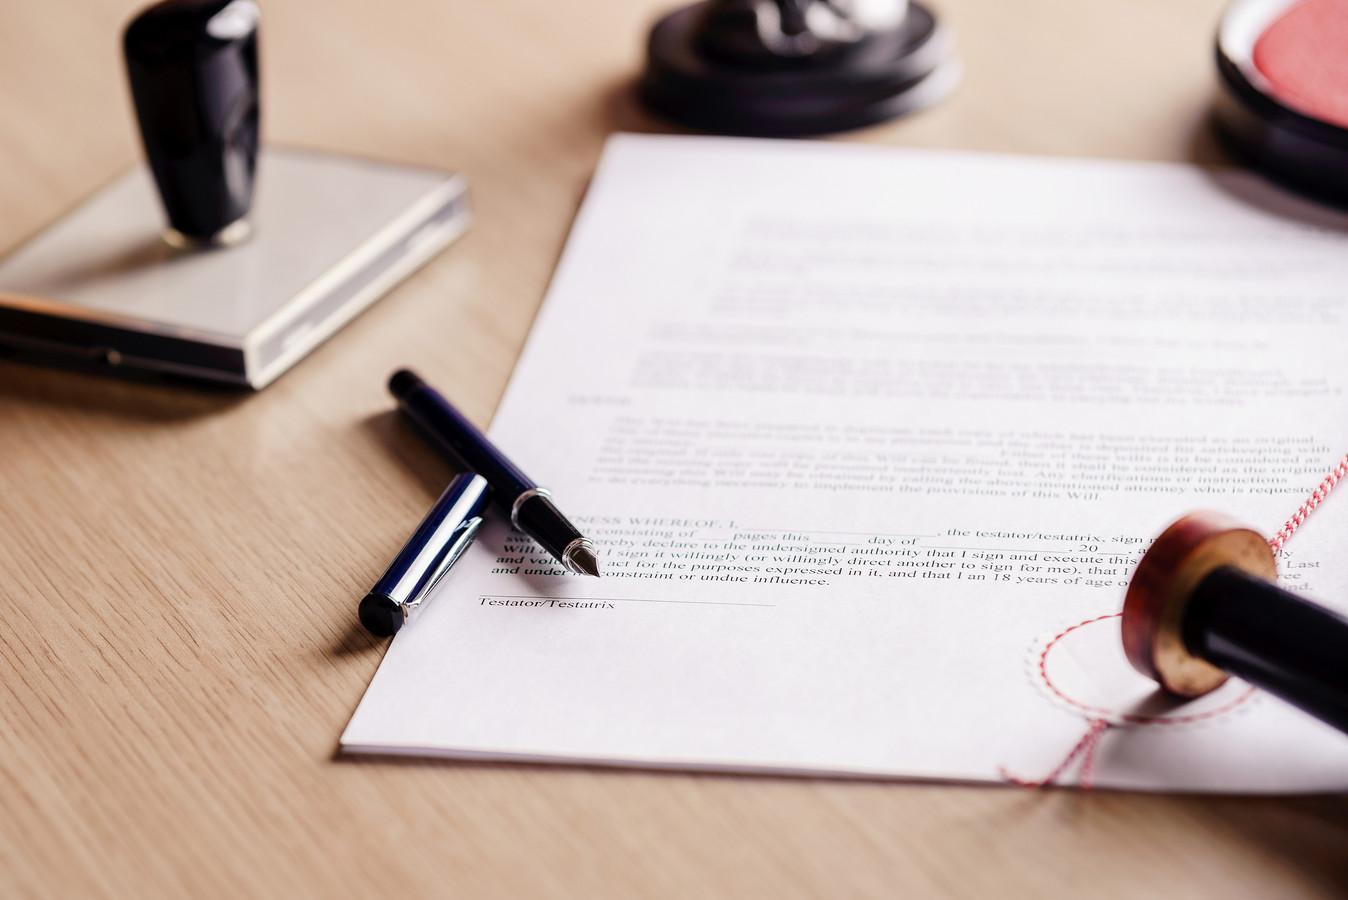 Notaris notariskantoor testament document notary administratie